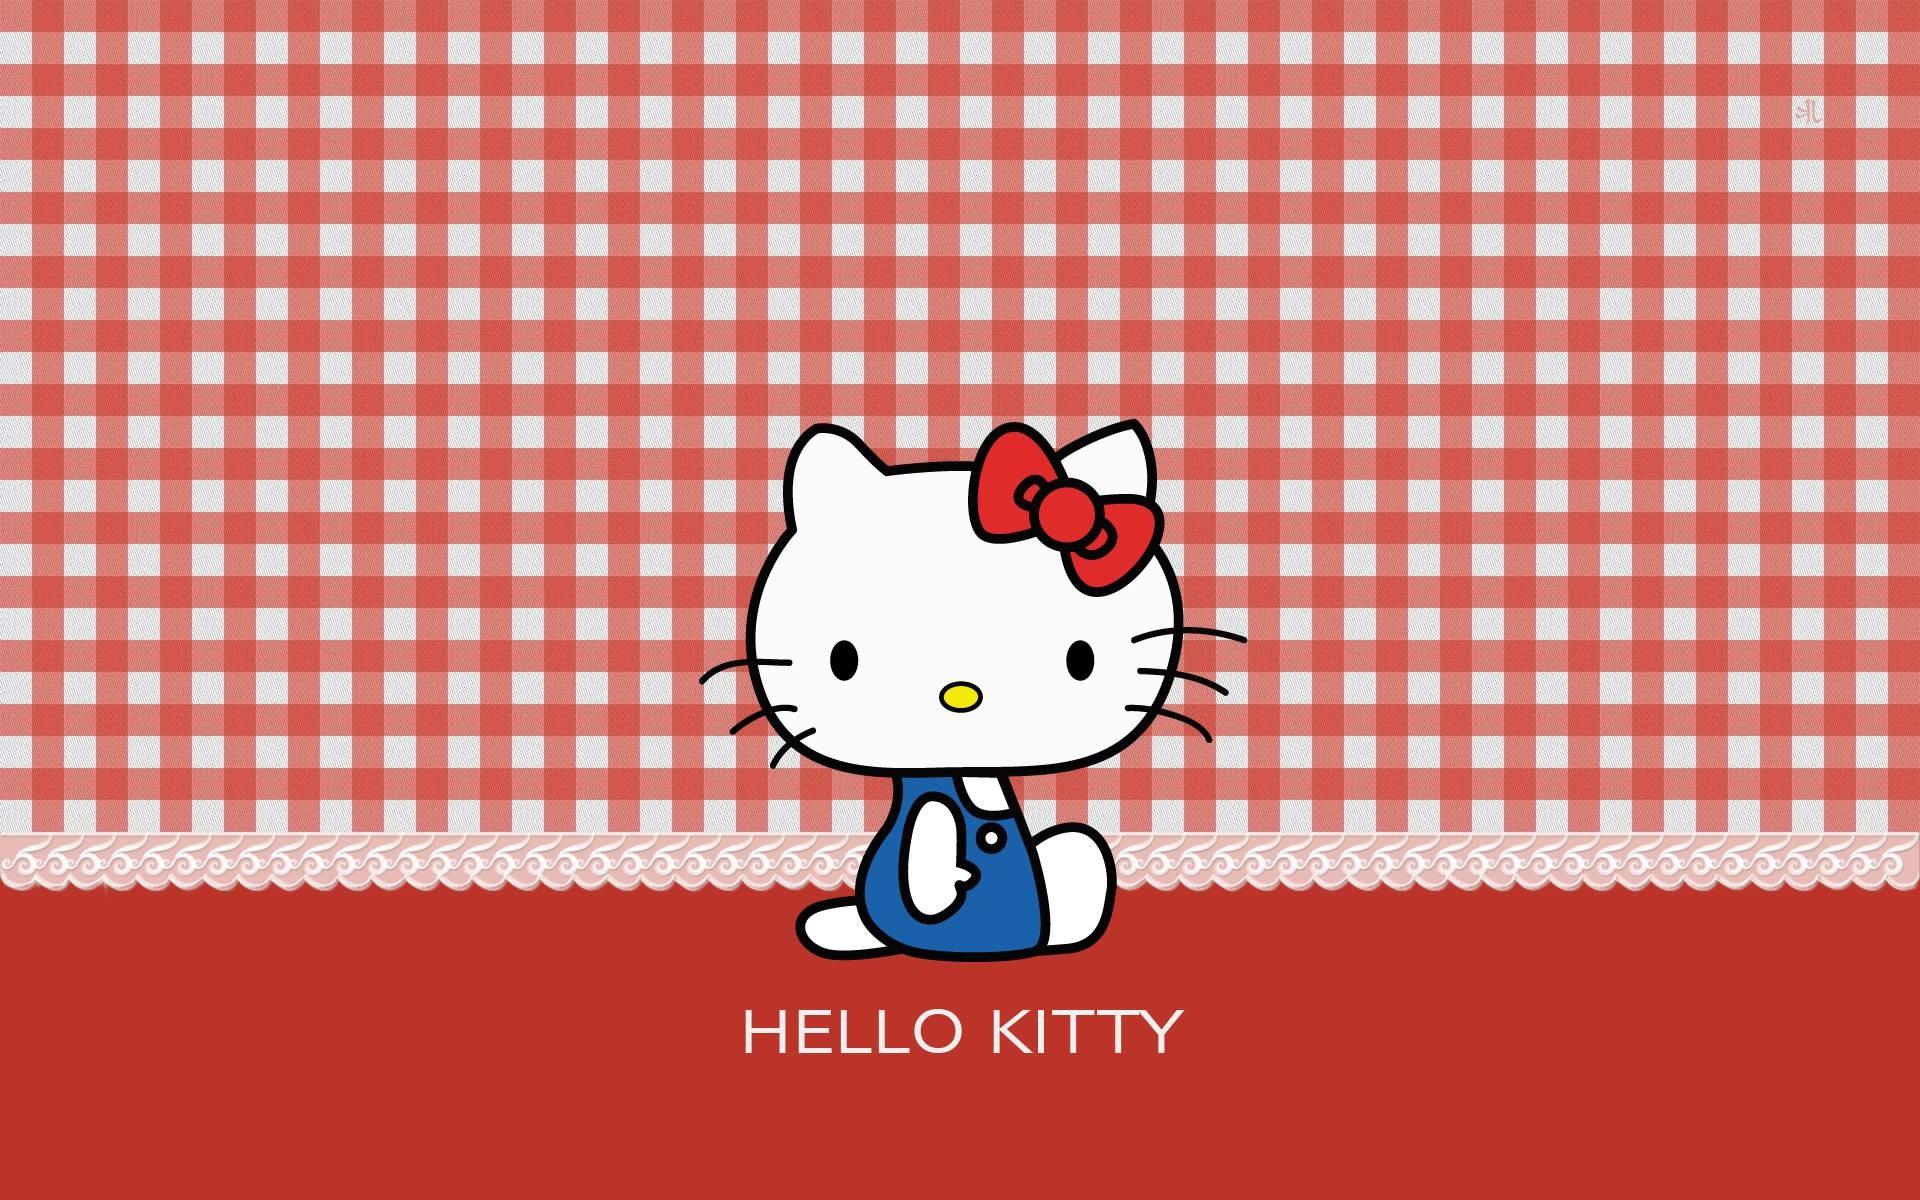 Hello Kitty Hd Wallpaper Wallpapertag